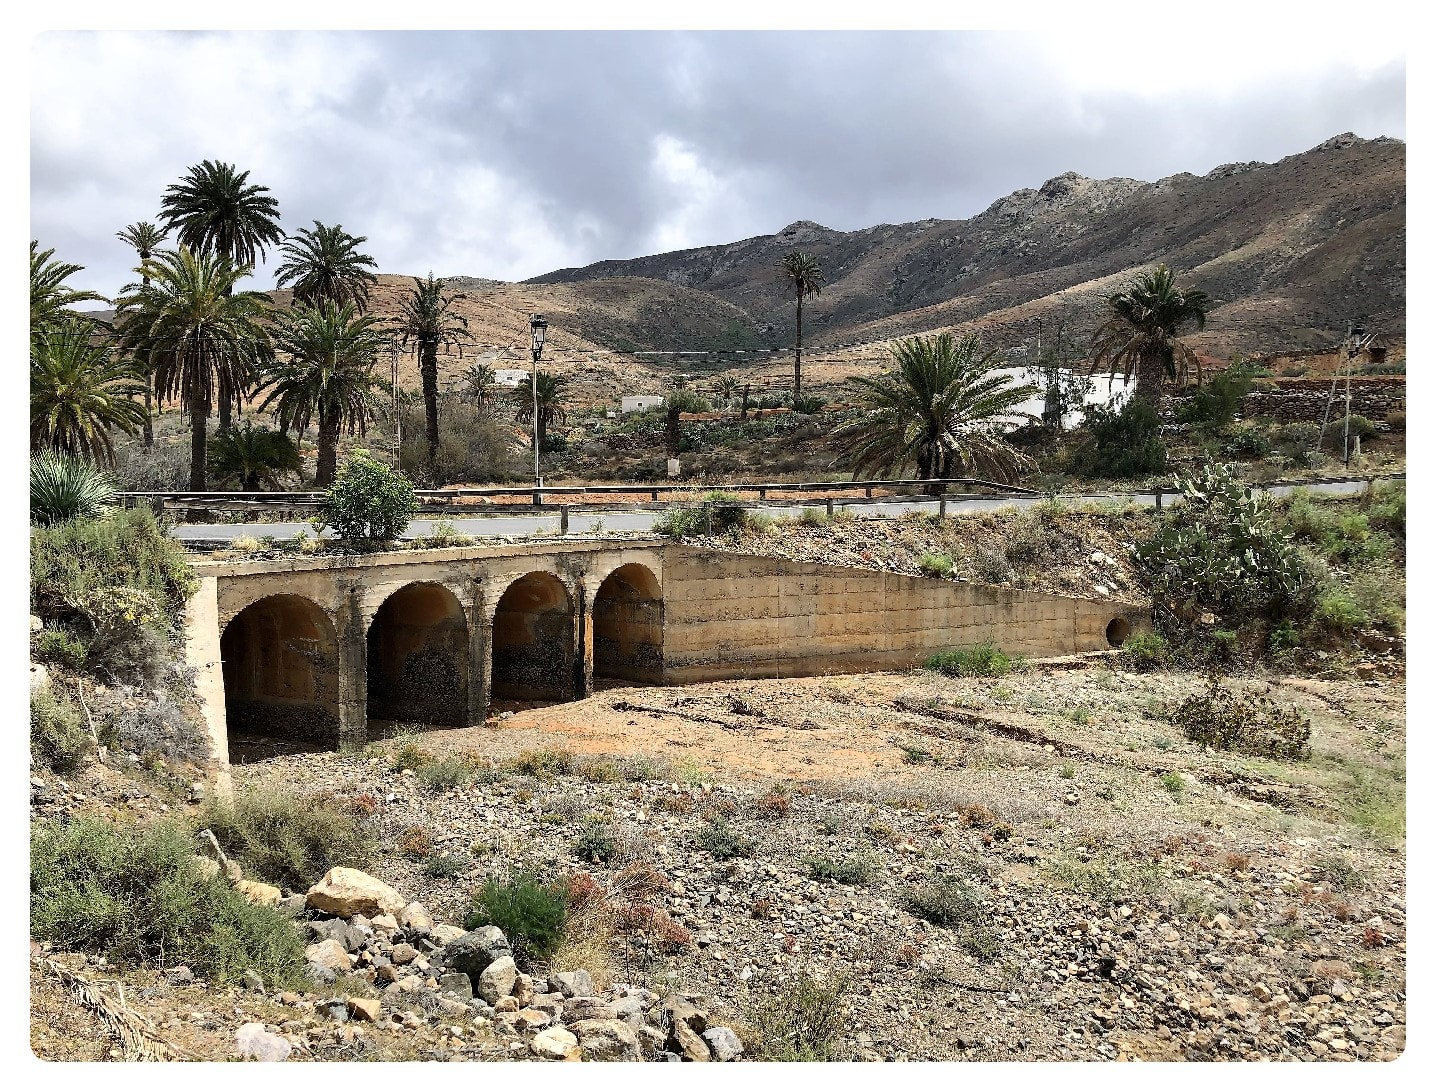 Wanderung Fuerteventura Startpunkt